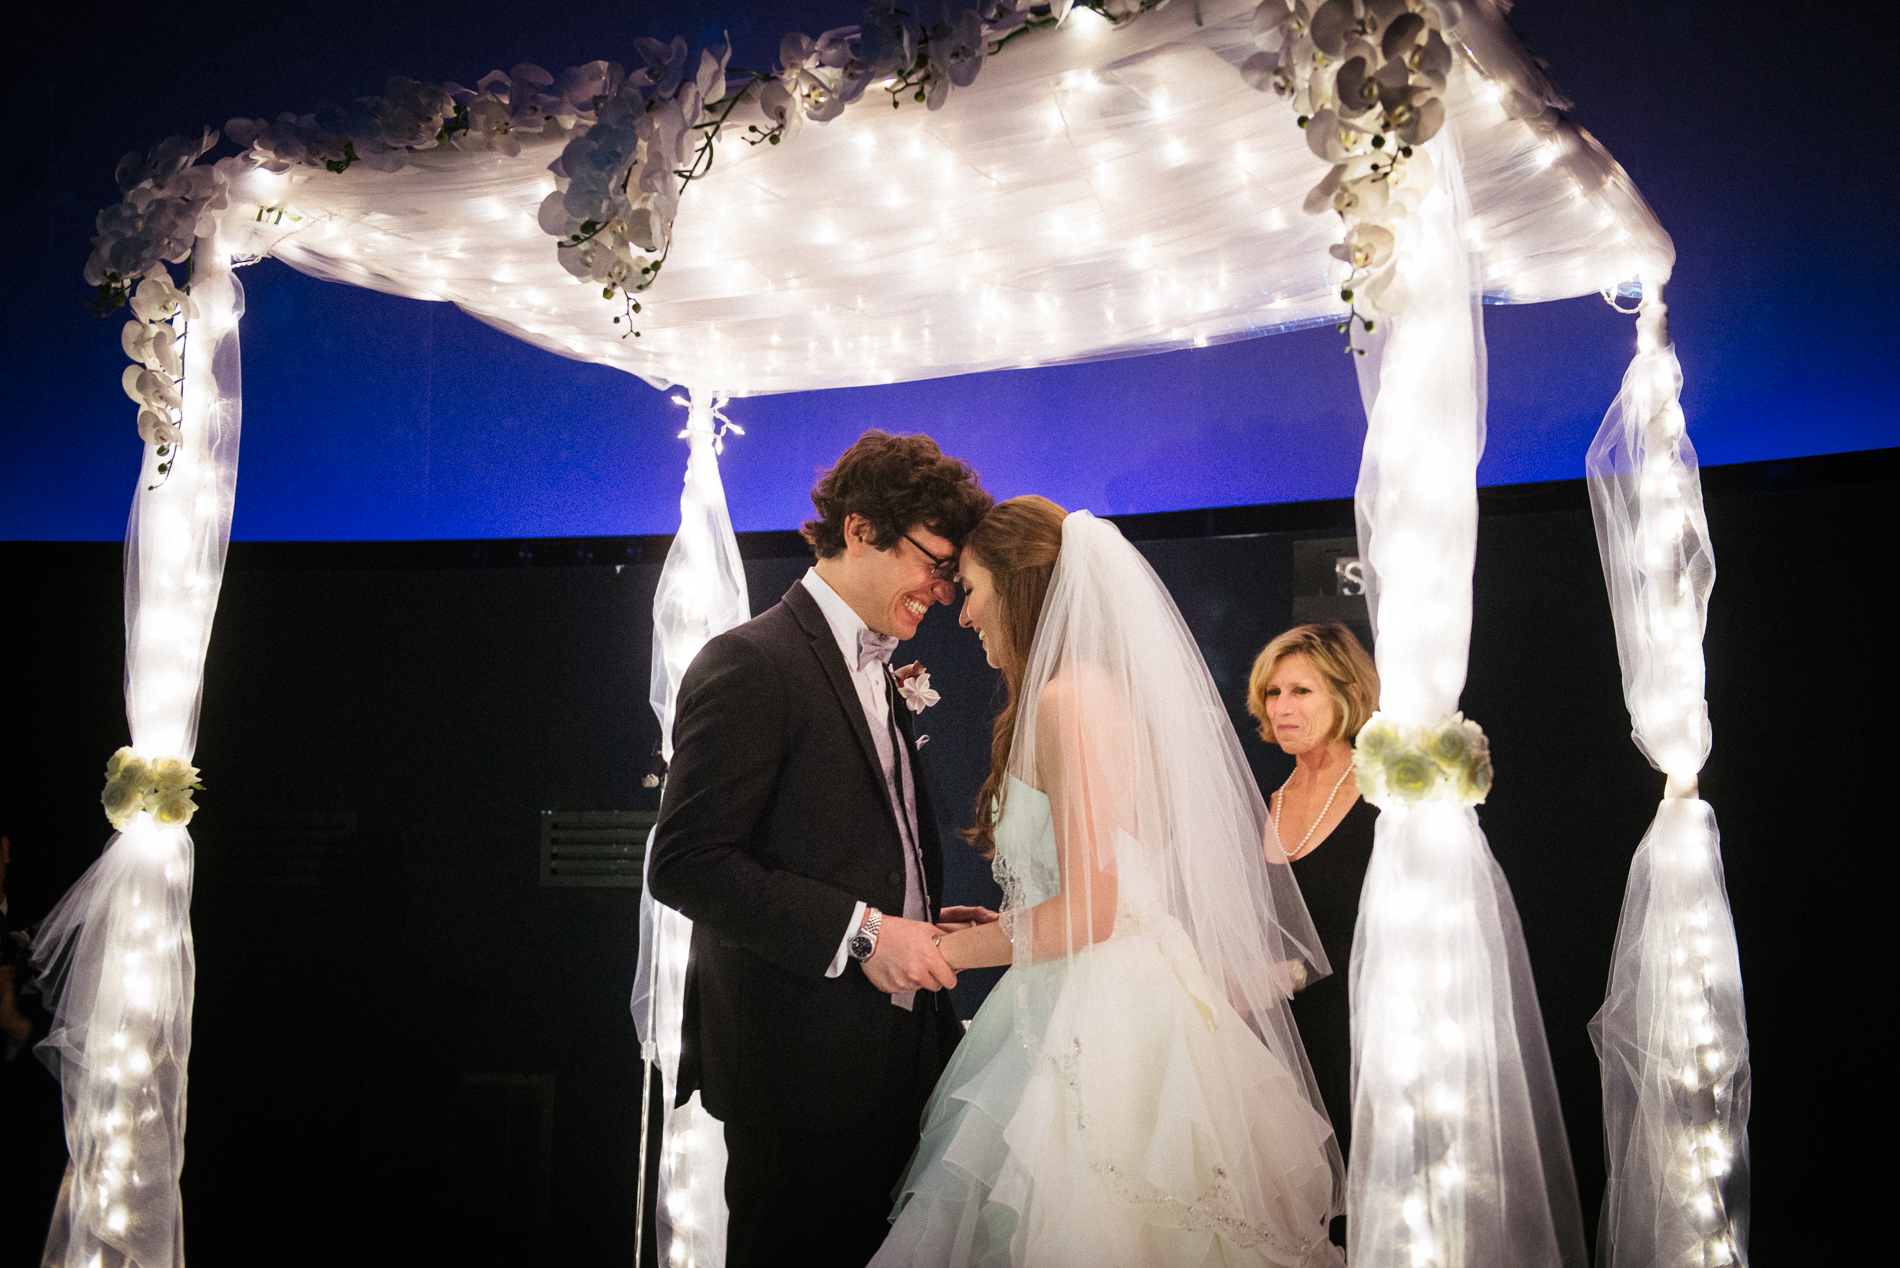 wedding_sml-9806.jpg